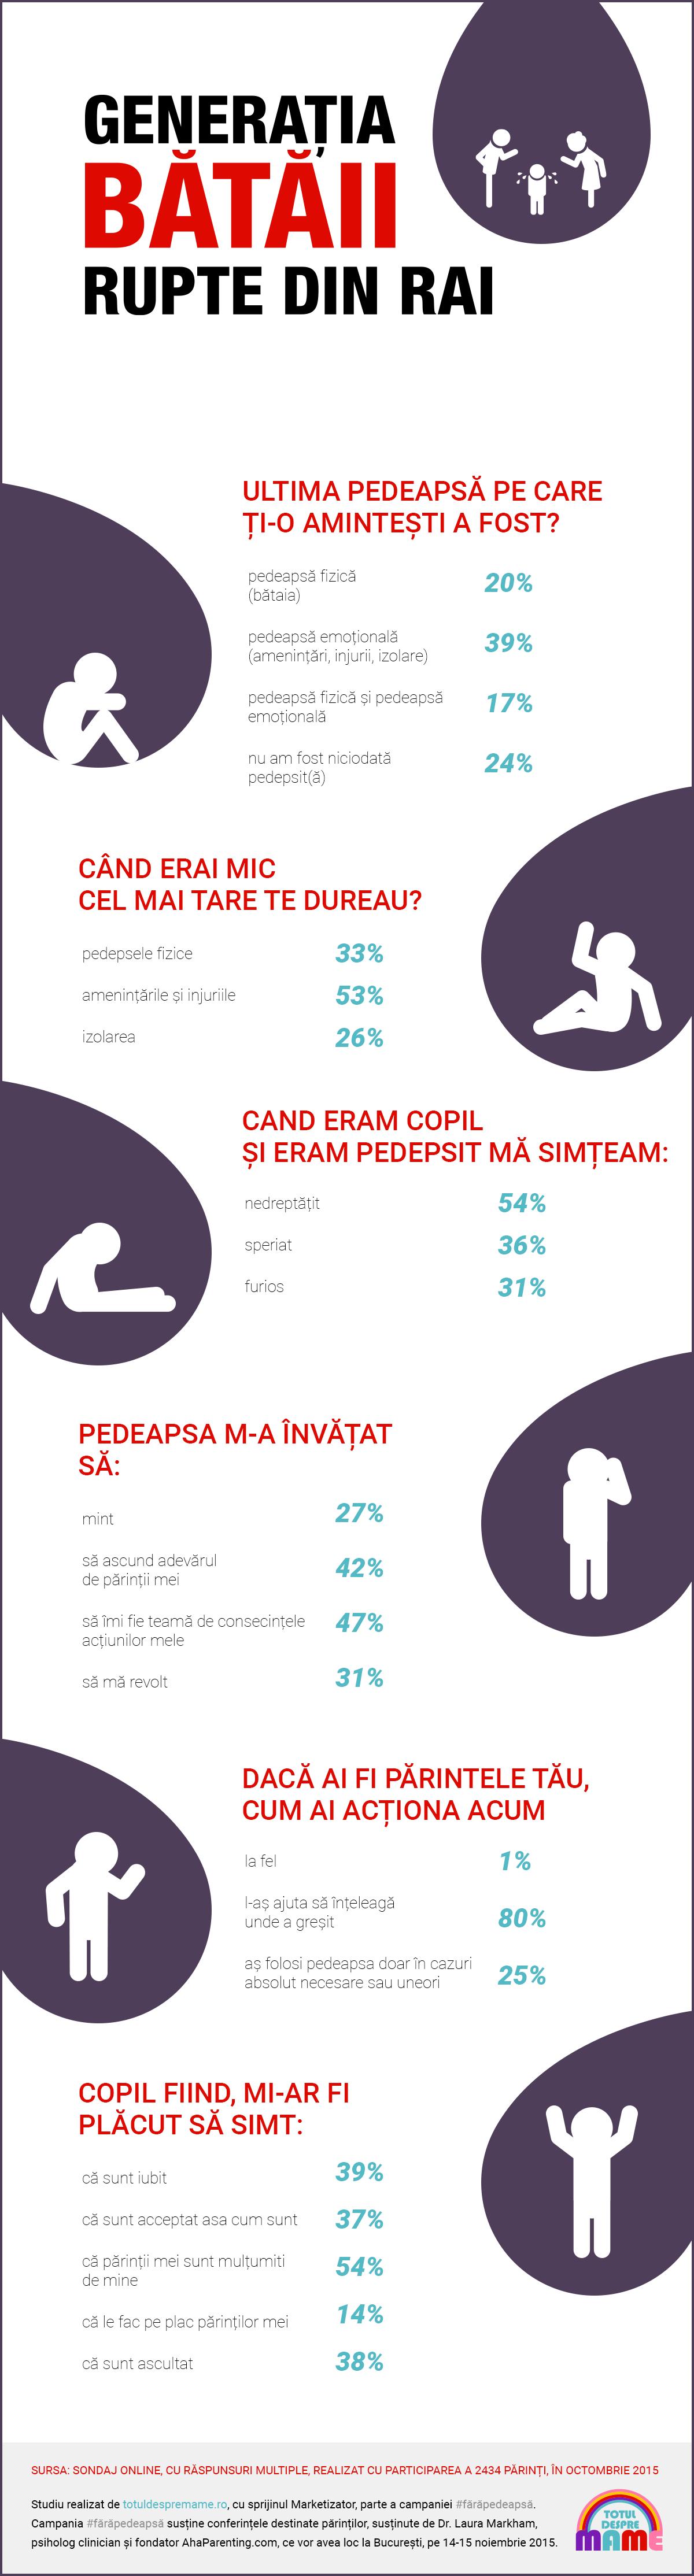 Infografia GENERATIA BATAII RUPTE DIN RAI (1)